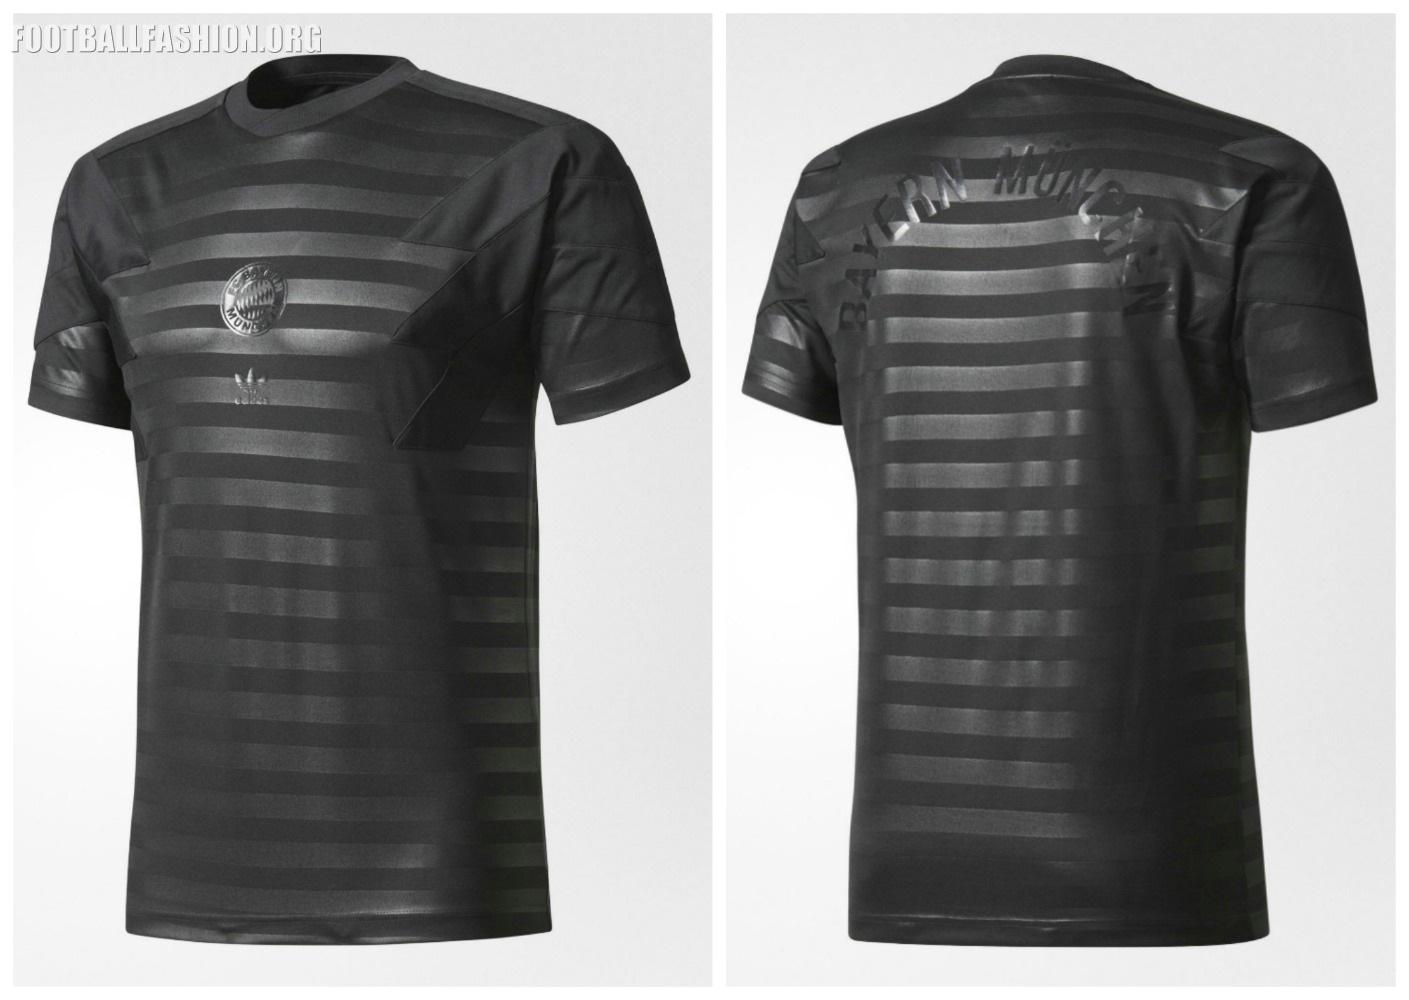 bayern m nchen 2017 18 adidas originals retro kits football fashion org. Black Bedroom Furniture Sets. Home Design Ideas